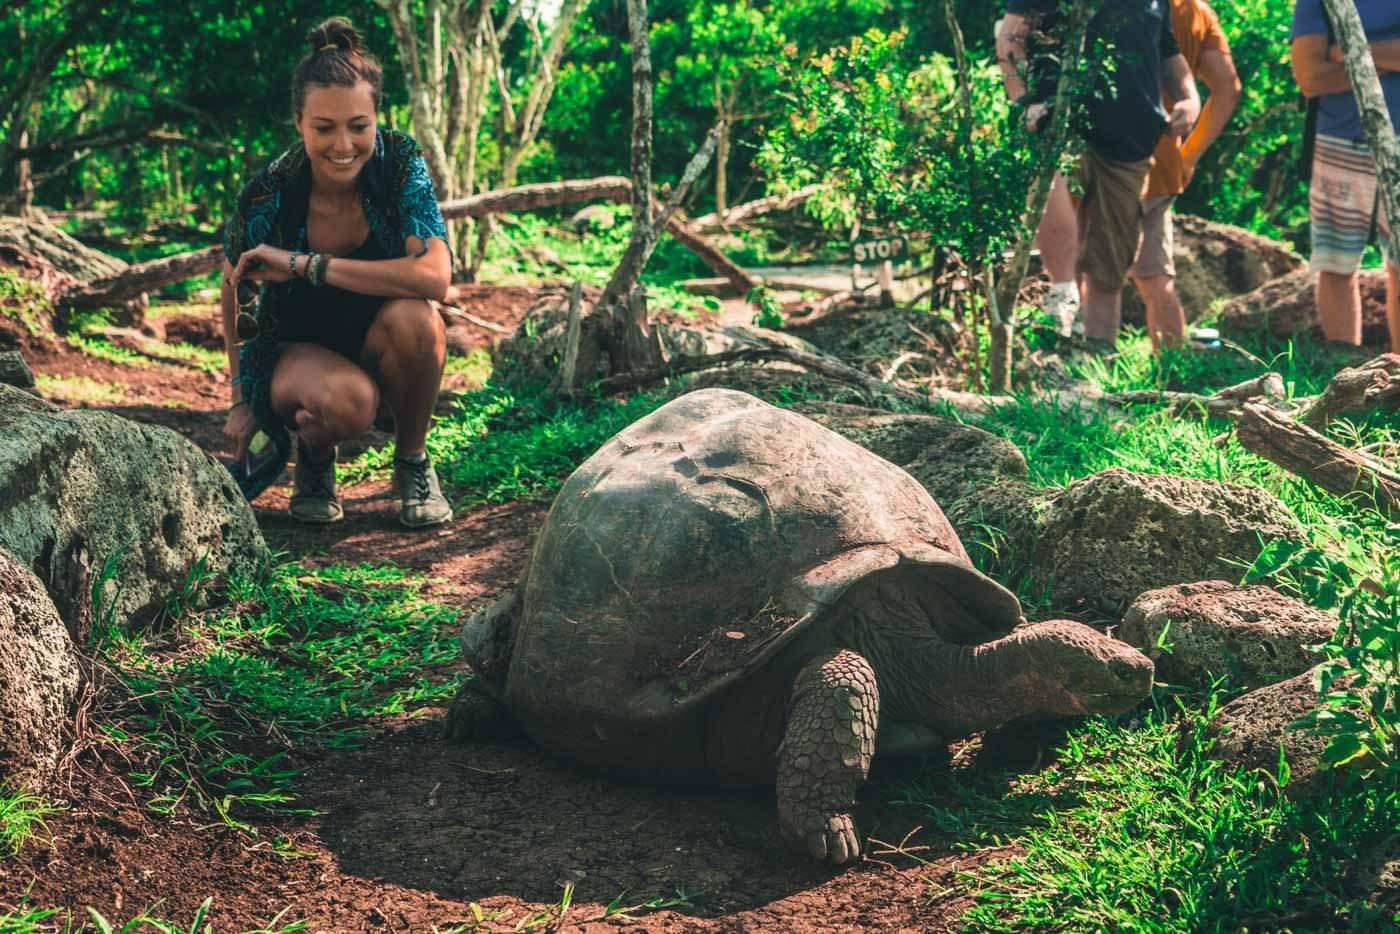 ethical wildlife experiences